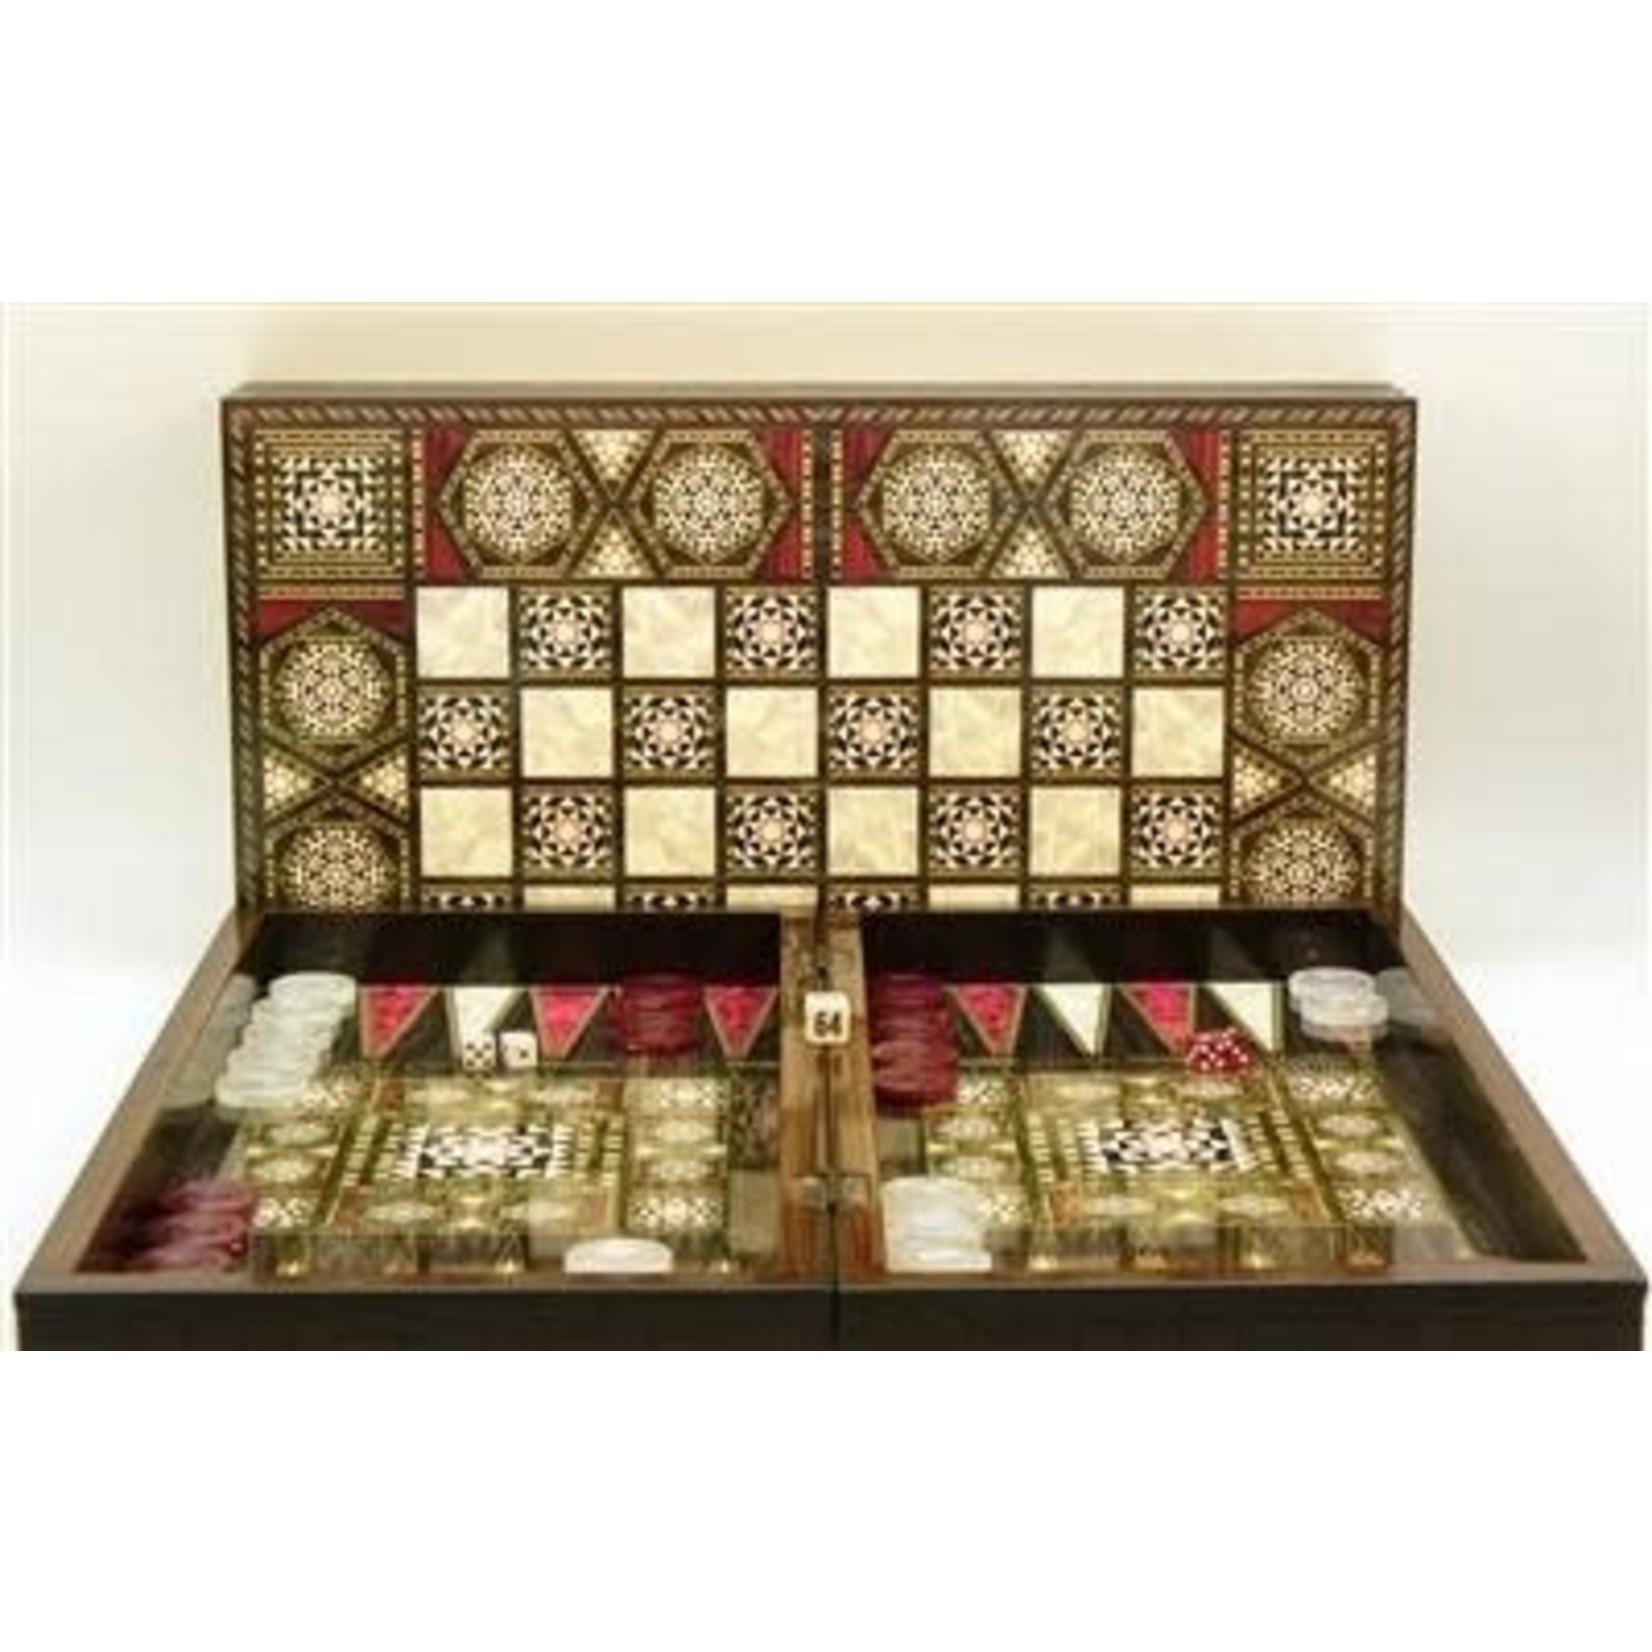 "WorldWise Imports 20"" Pearl Mosaic Backgammon Set w/ Chess Board"